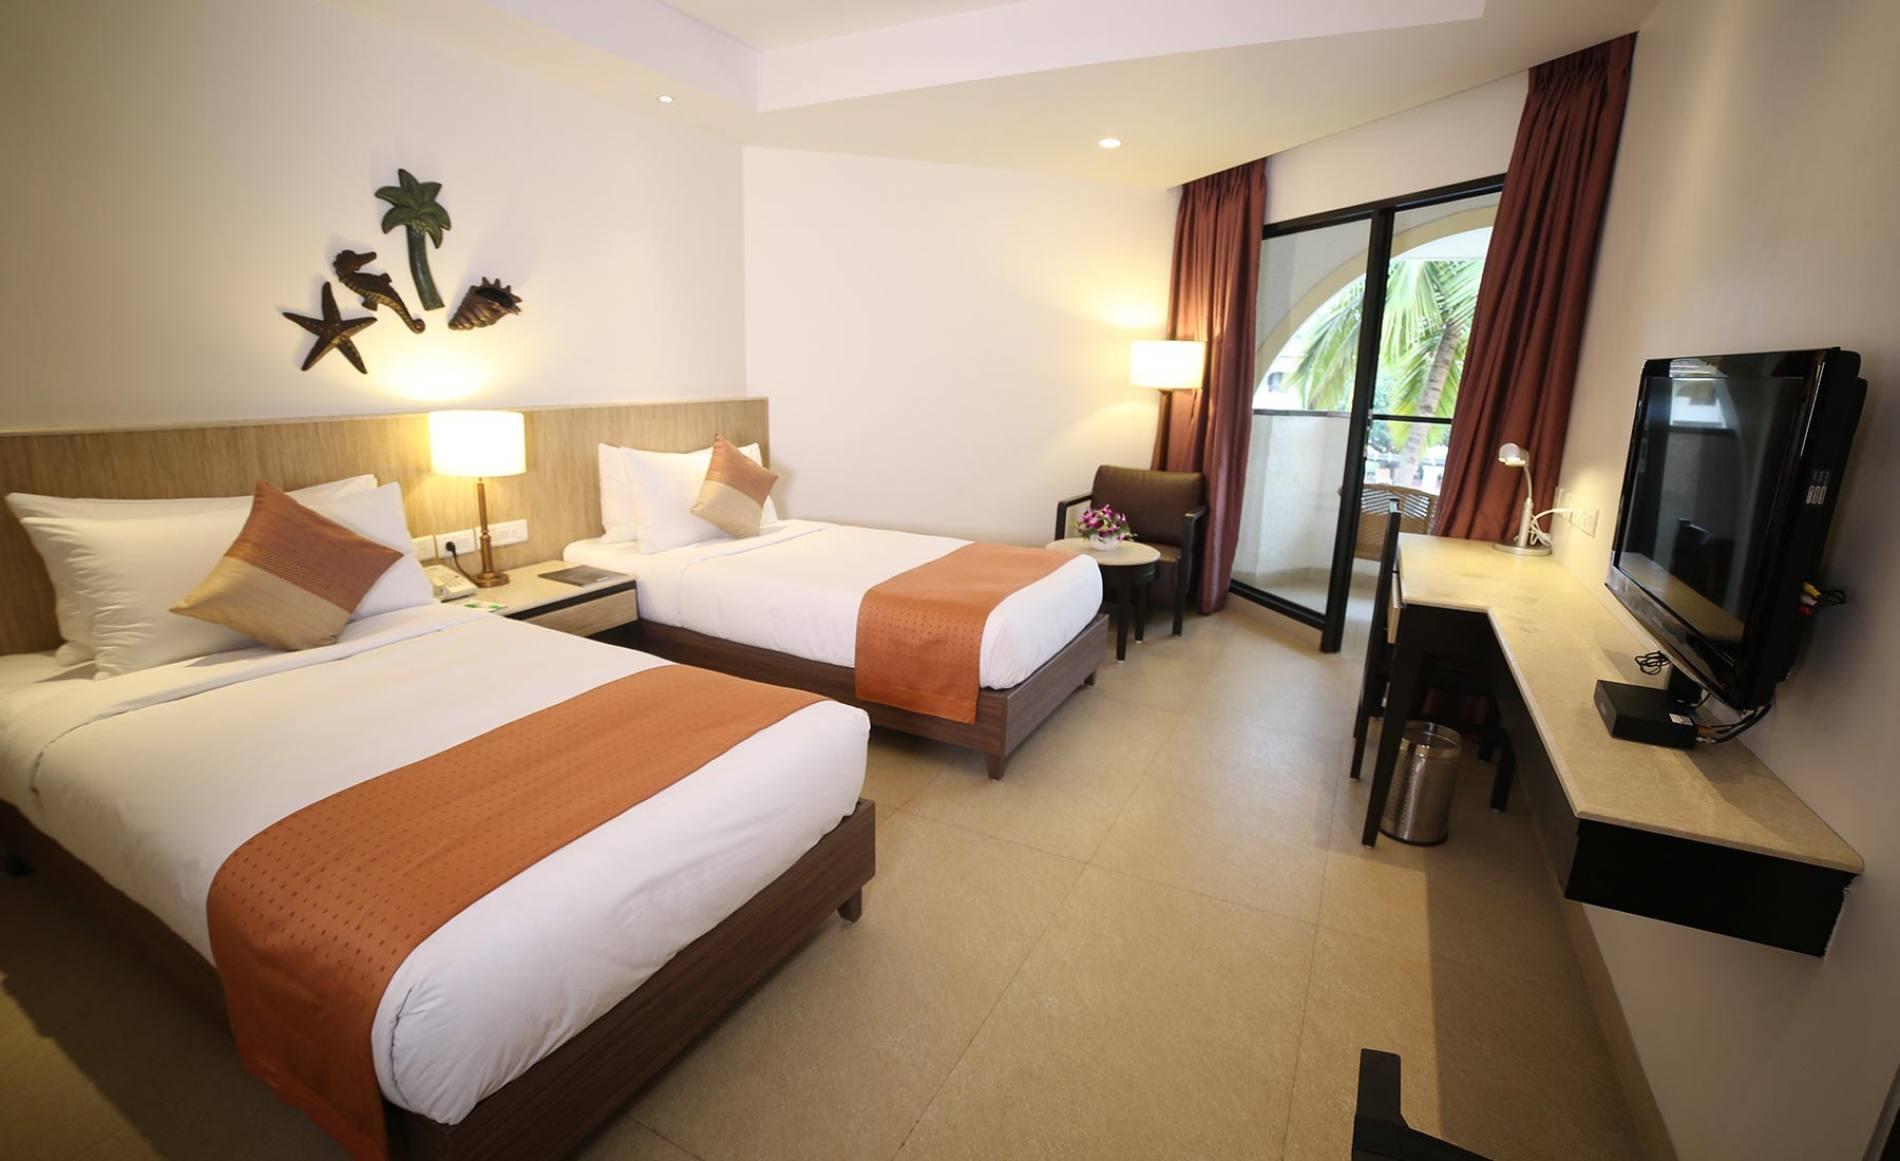 India Beach Resort Vacation Rentals Goa